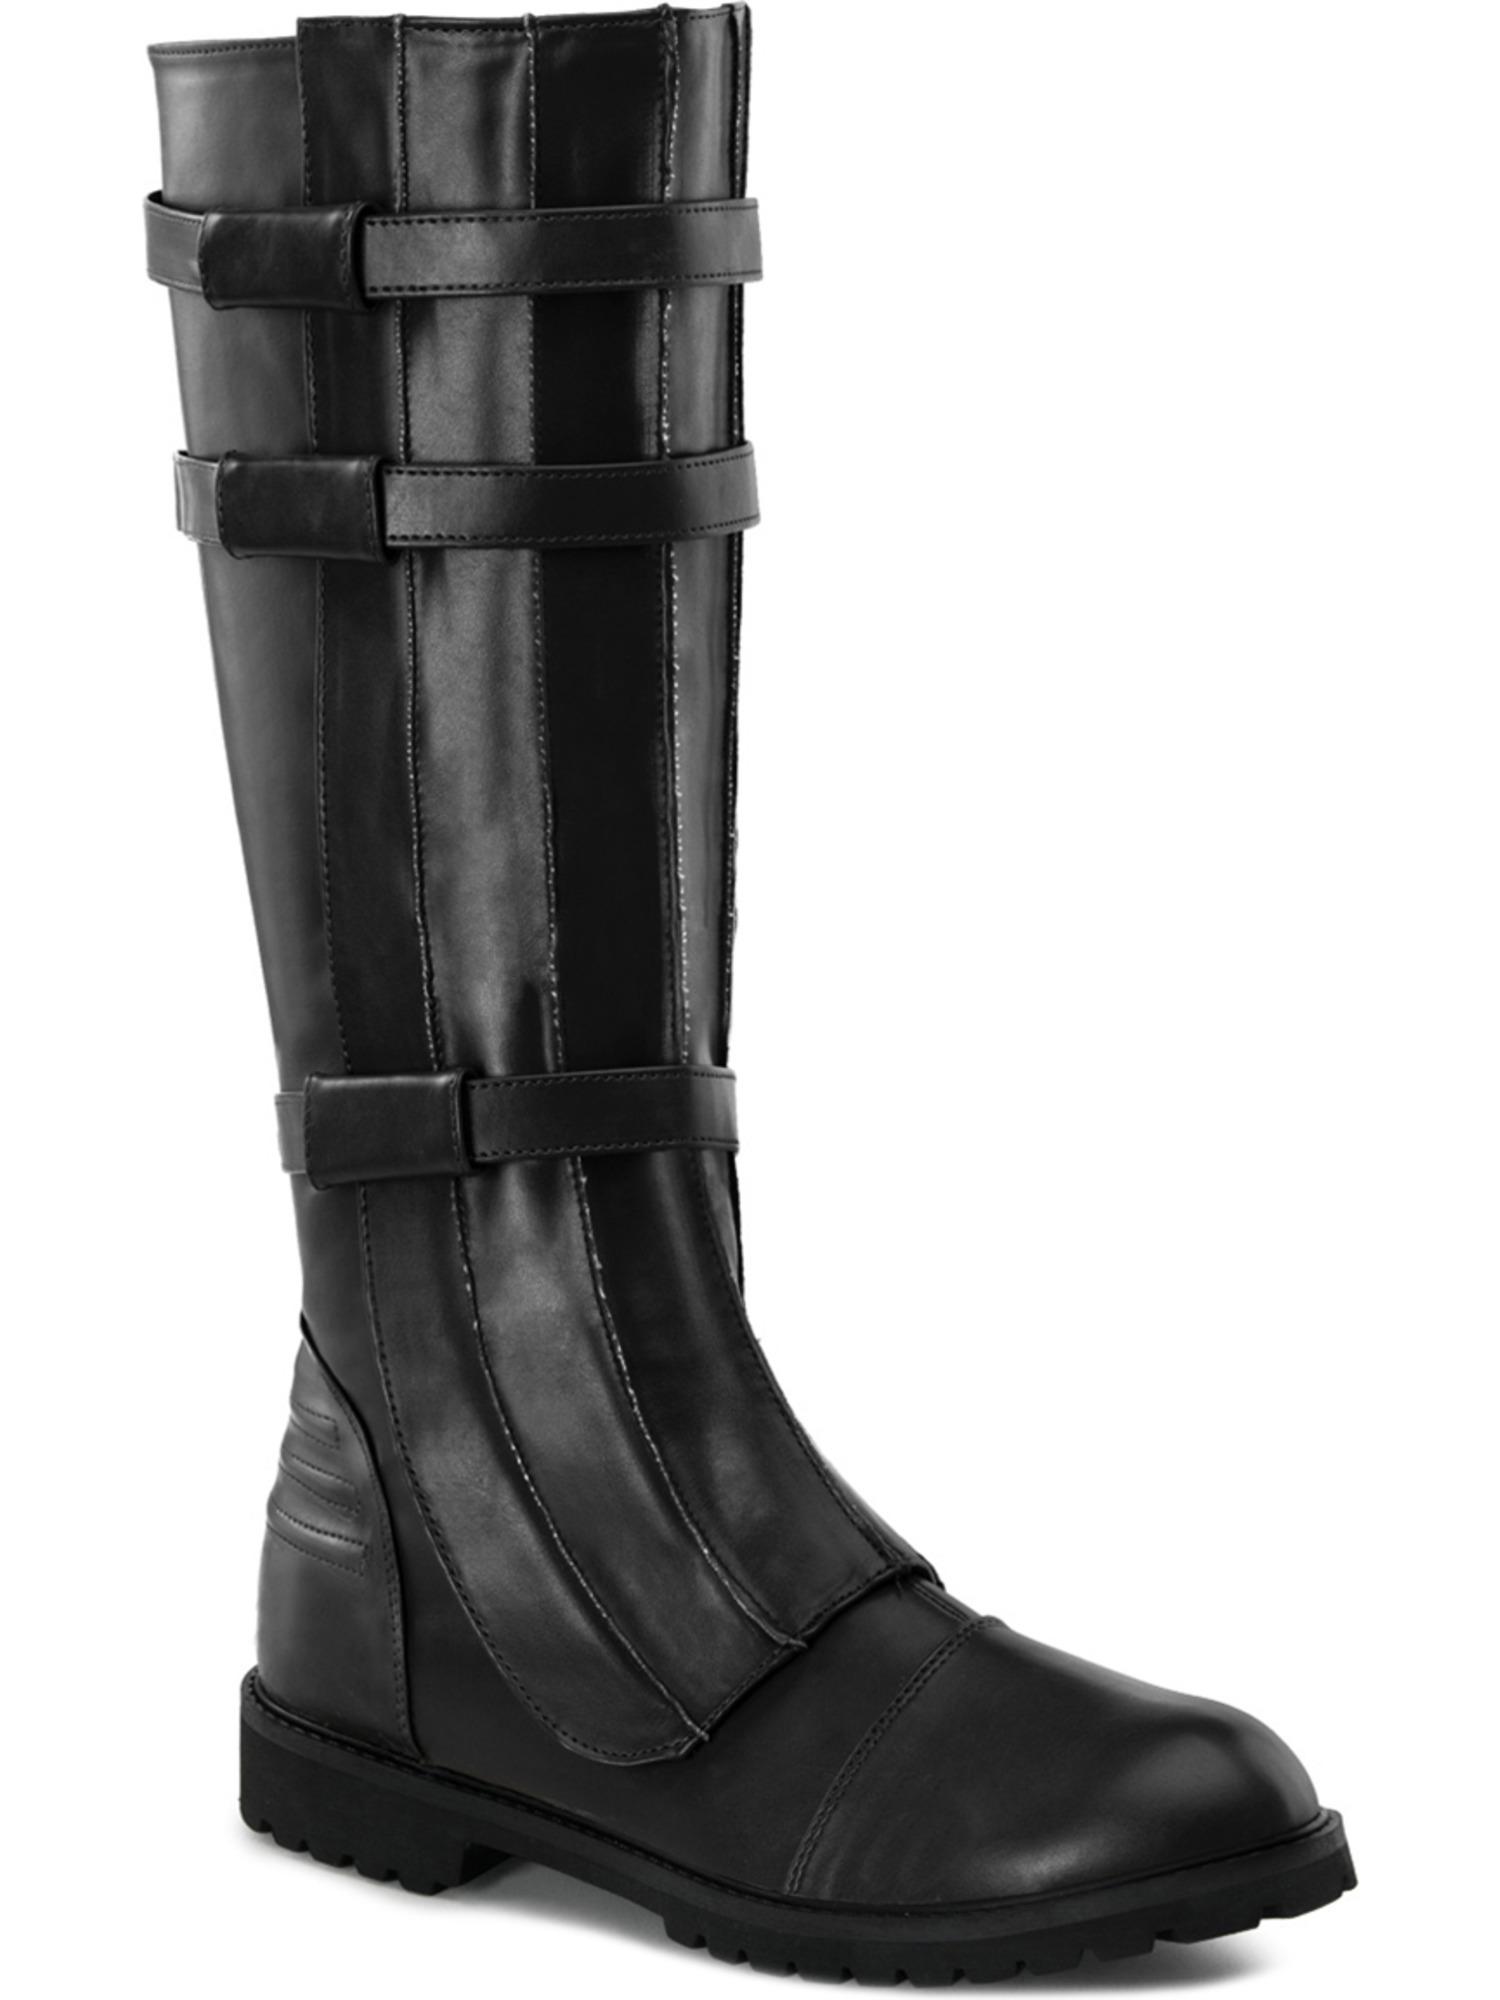 Black Knee High Boot Strap Detail Gothic MENS SIZING Low Heel FLAT